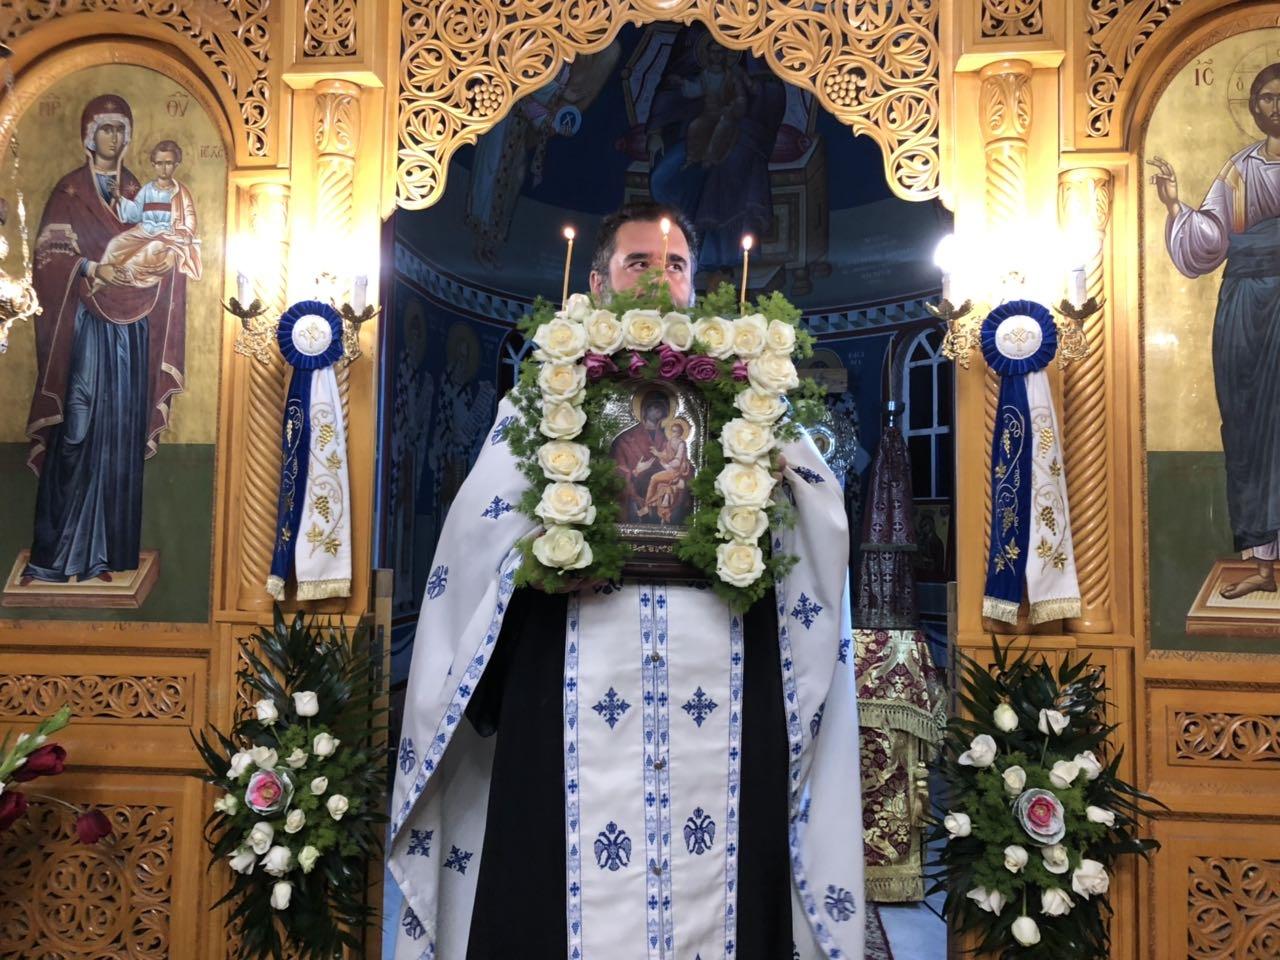 panagia gorgoypikoos2019 6 - Στον Αμπελώνα για την Παναγία τη Γοργοϋπήκοο ο Σεβασμιώτατος (φωτο)